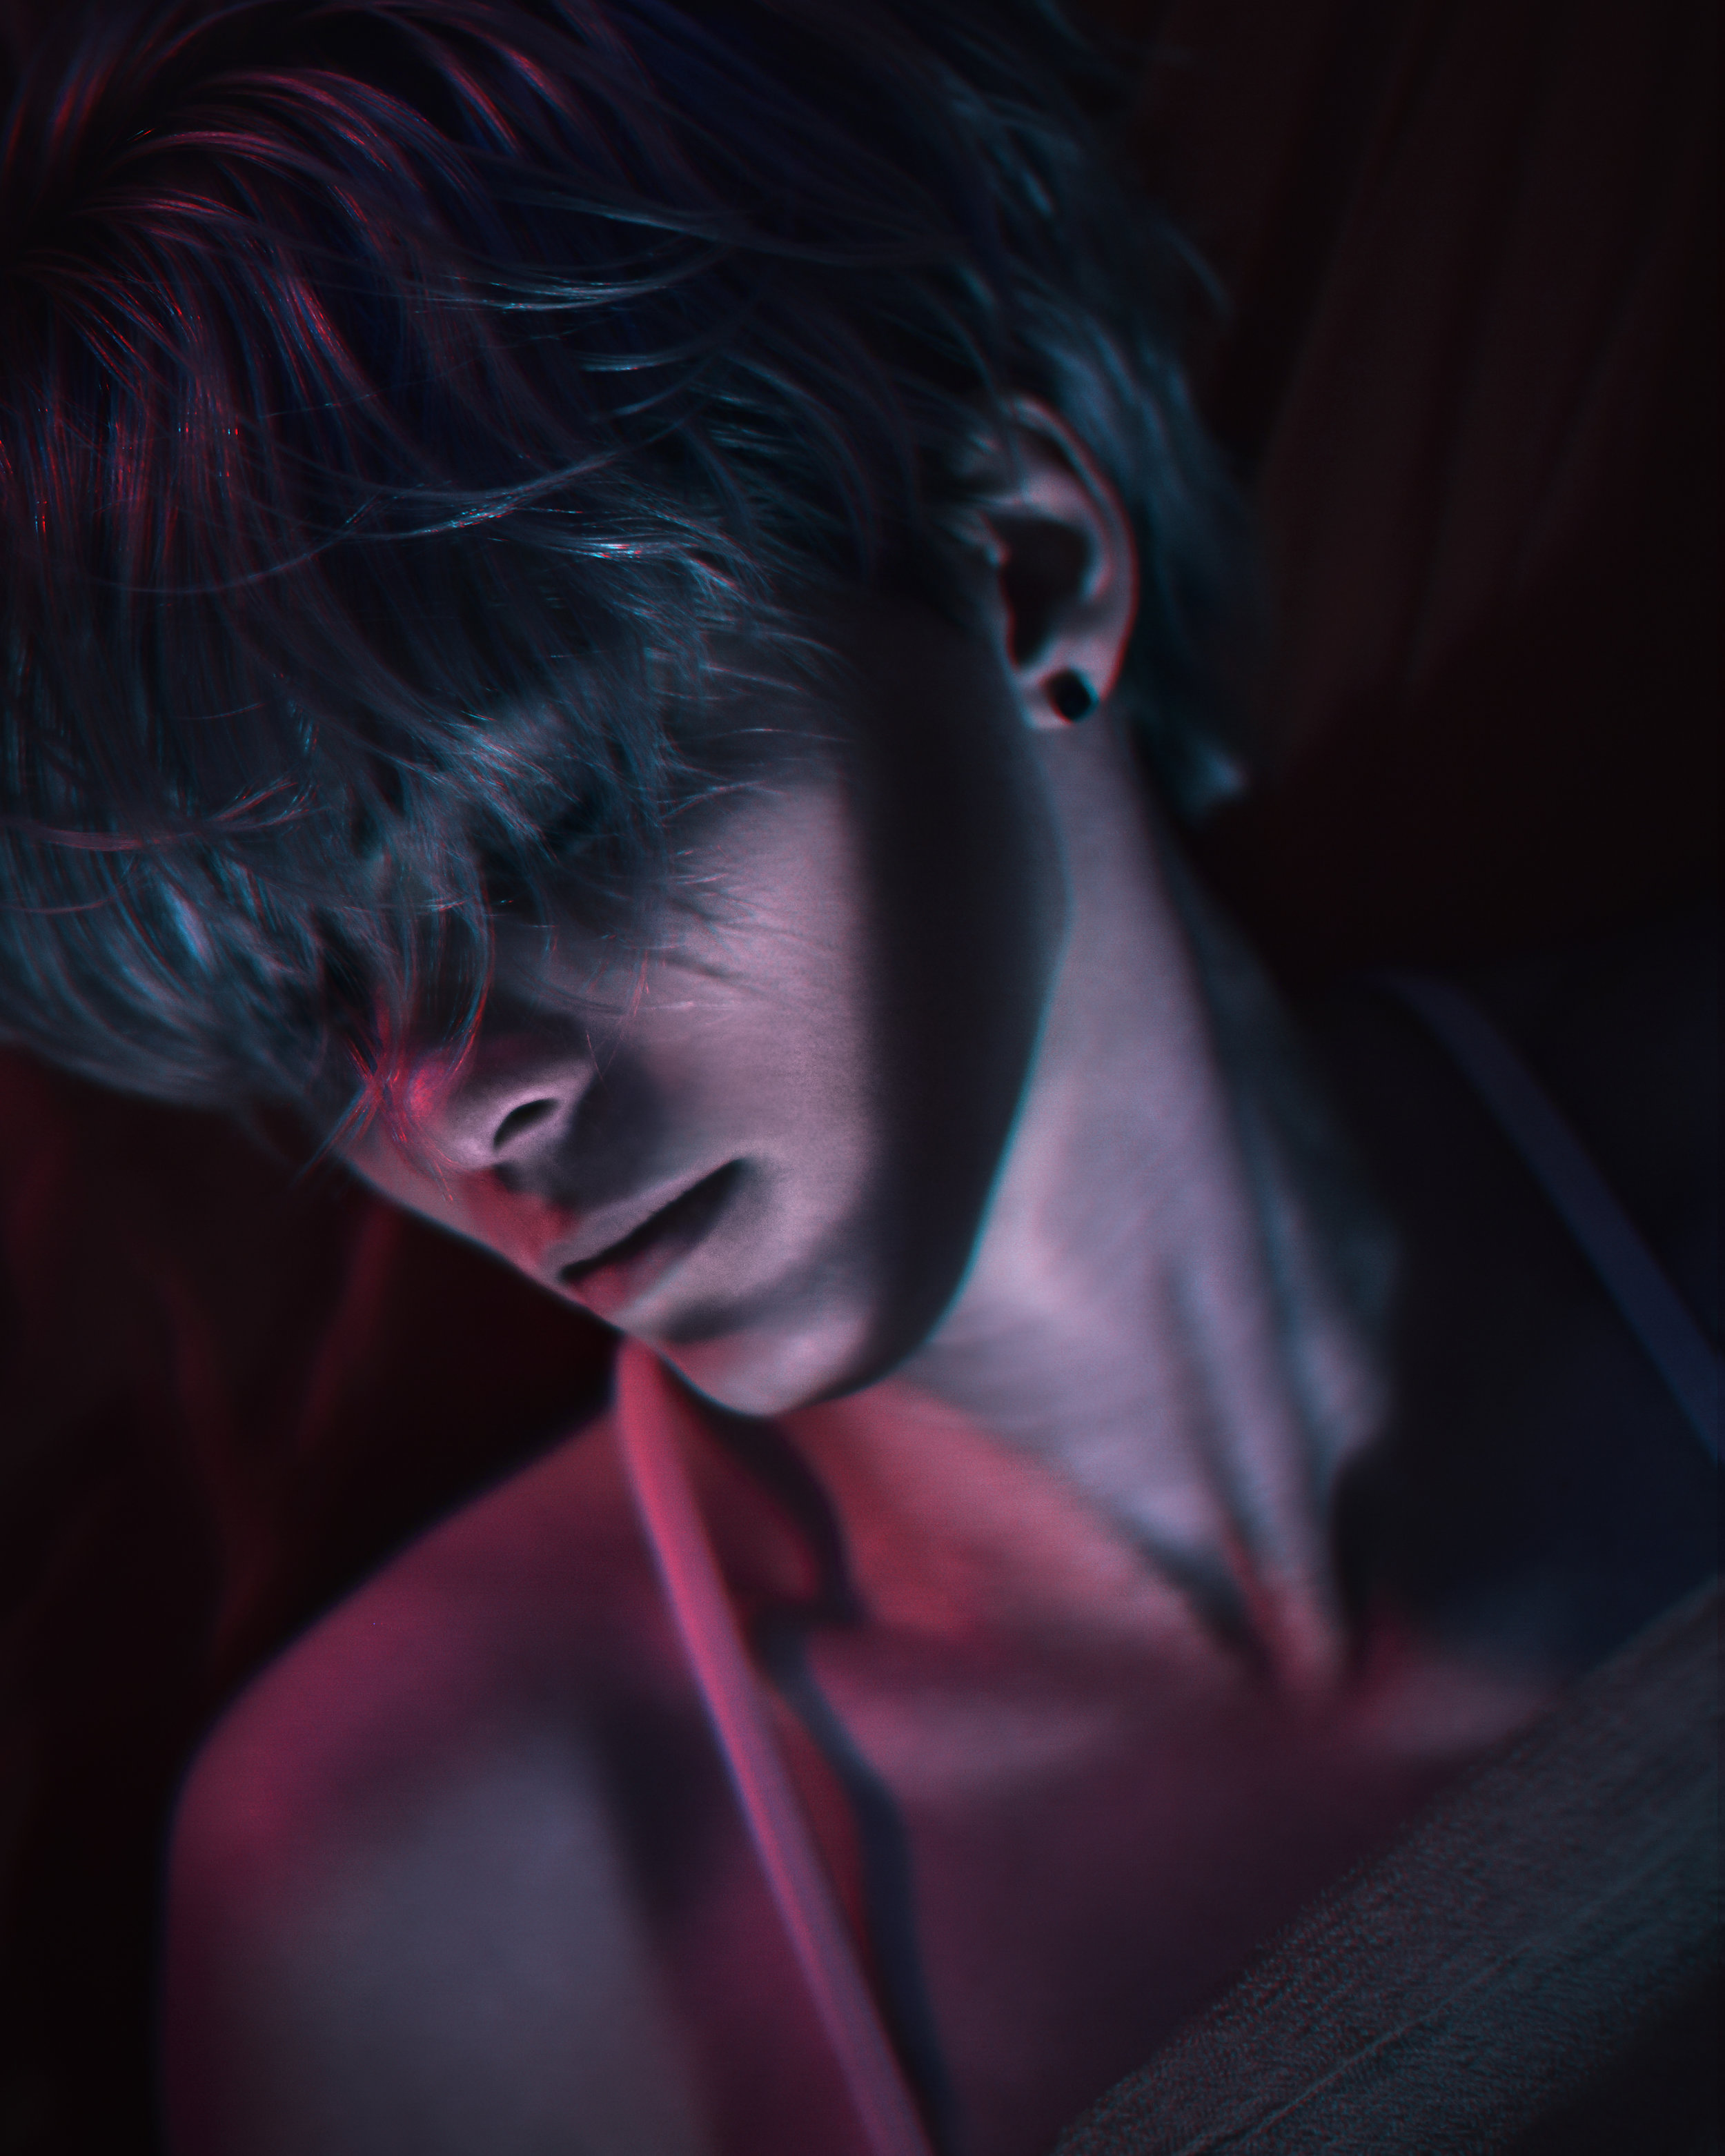 2017 Aug 17 Neon Self0621.jpg